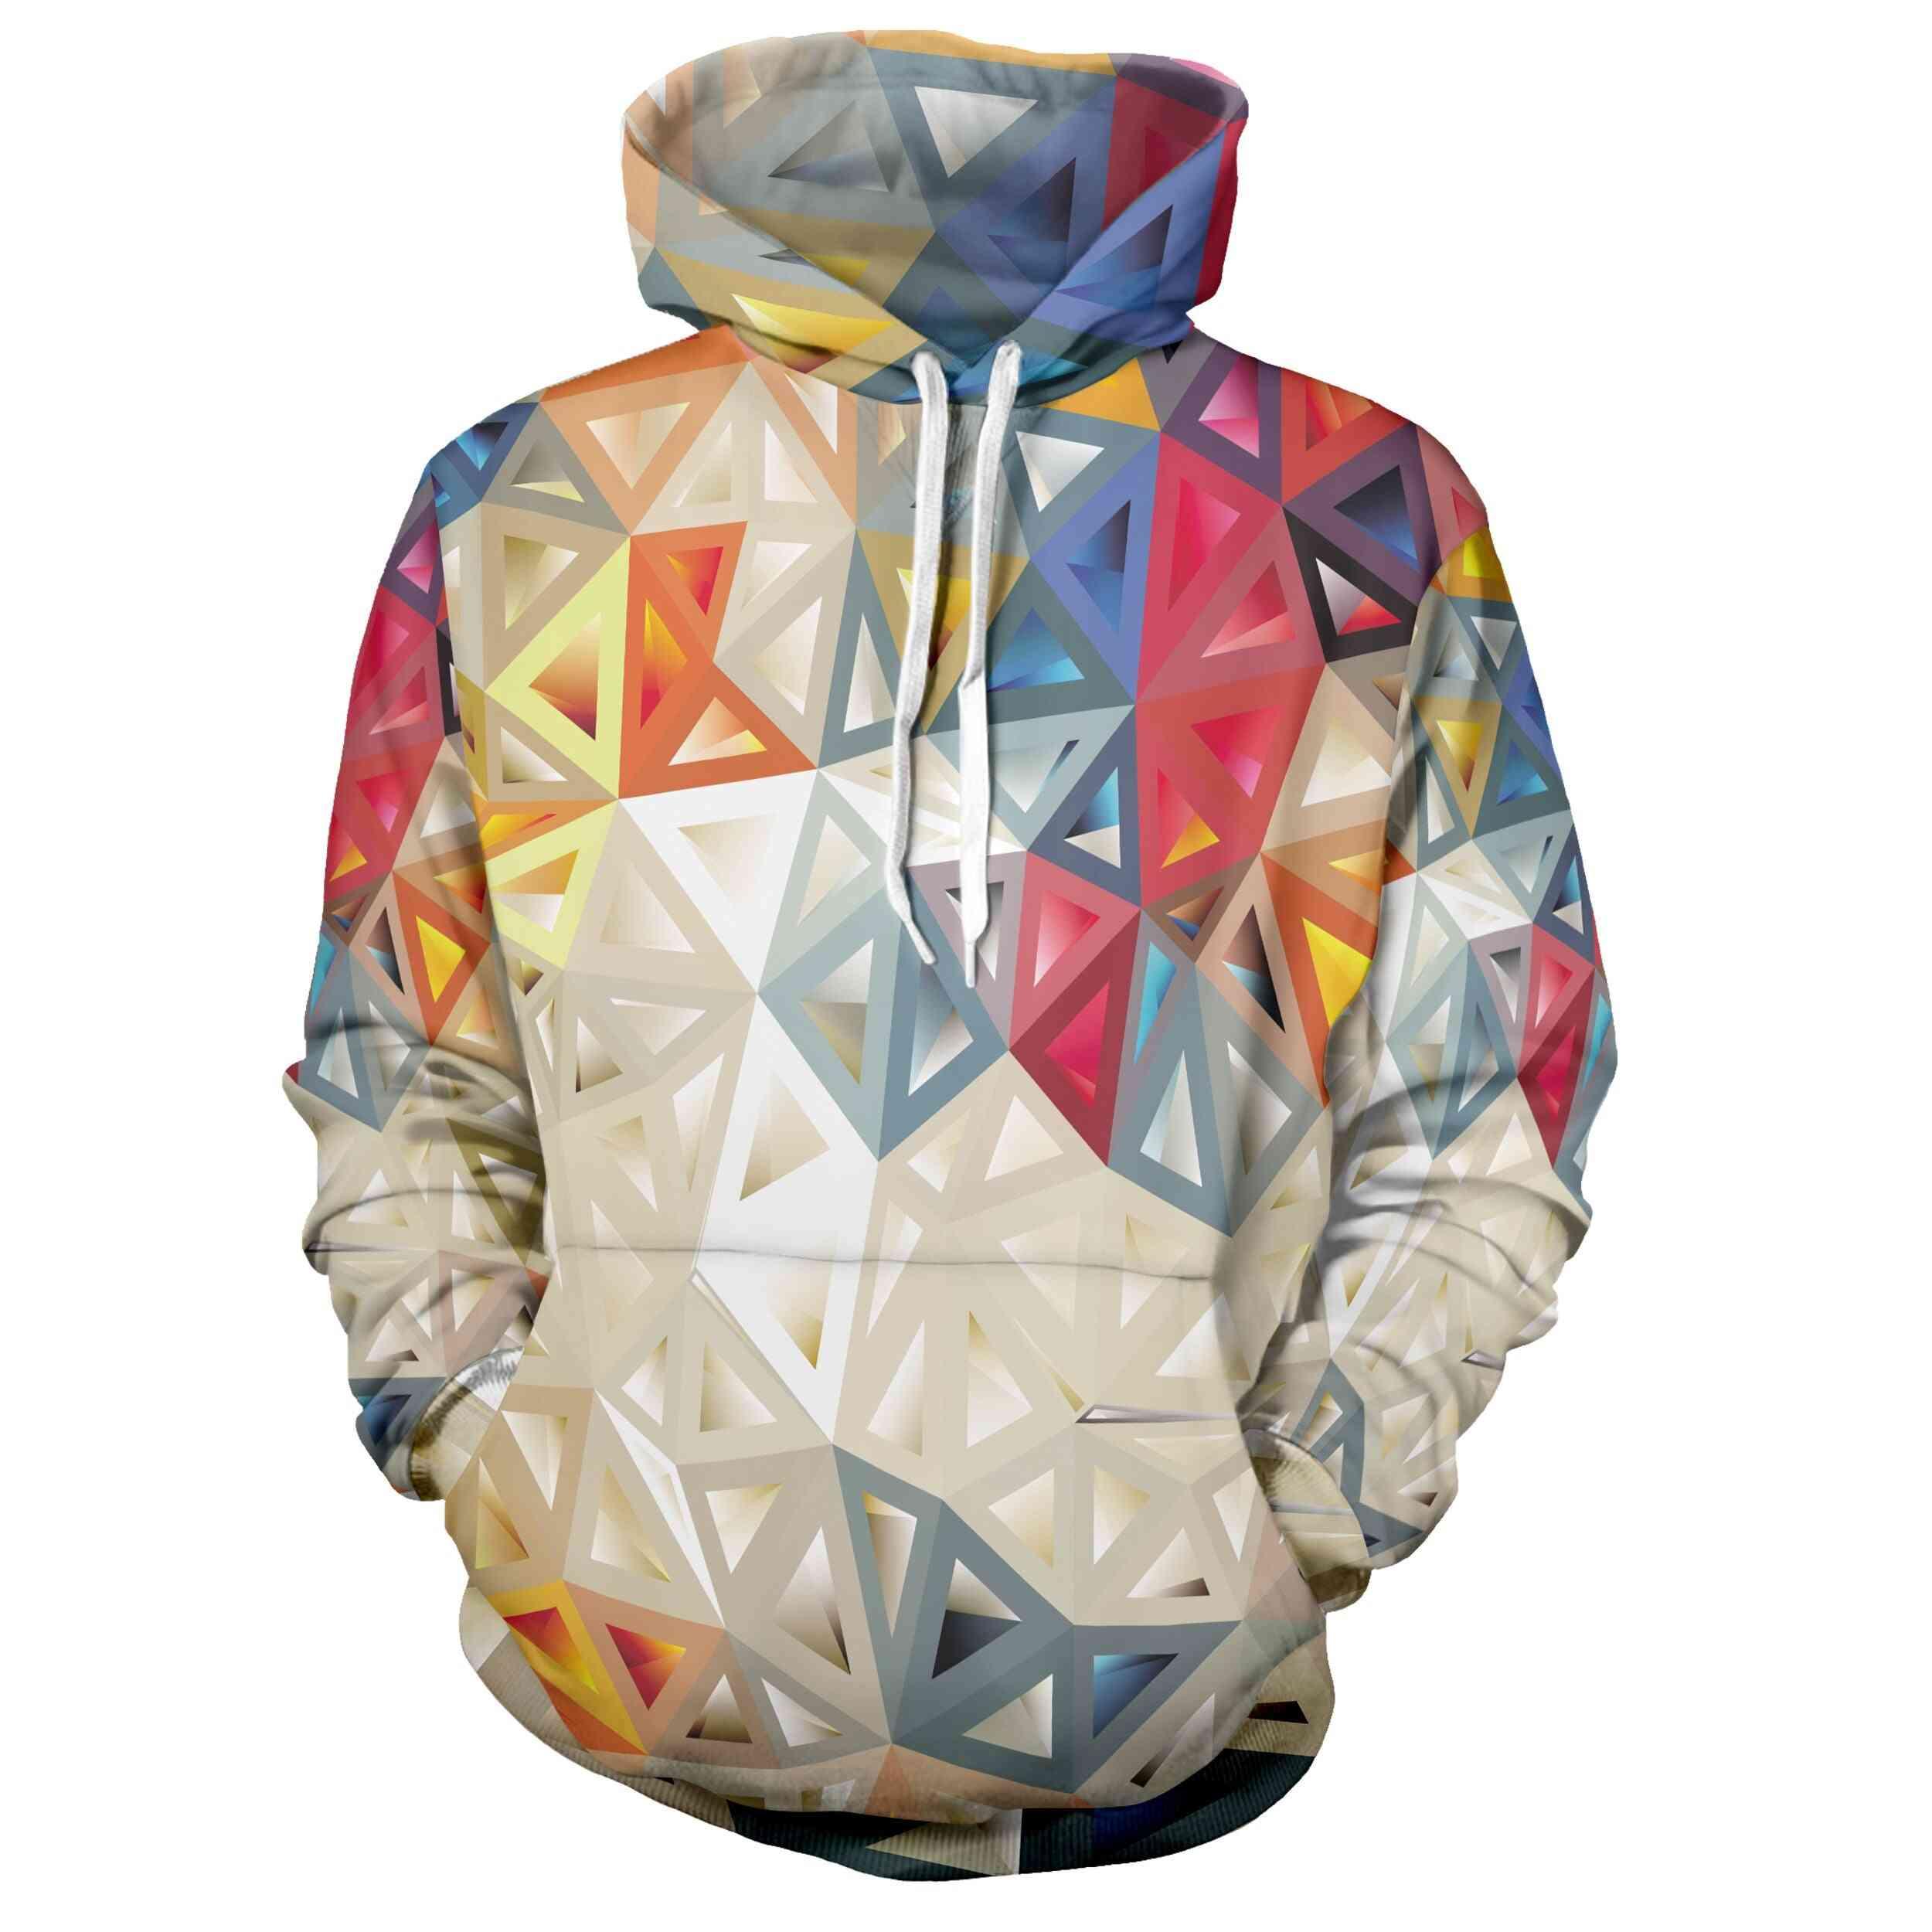 New Fun Gimmick 3d Hoodie, Skateboard Hoe Autumn And Winter Fashion Sportswear